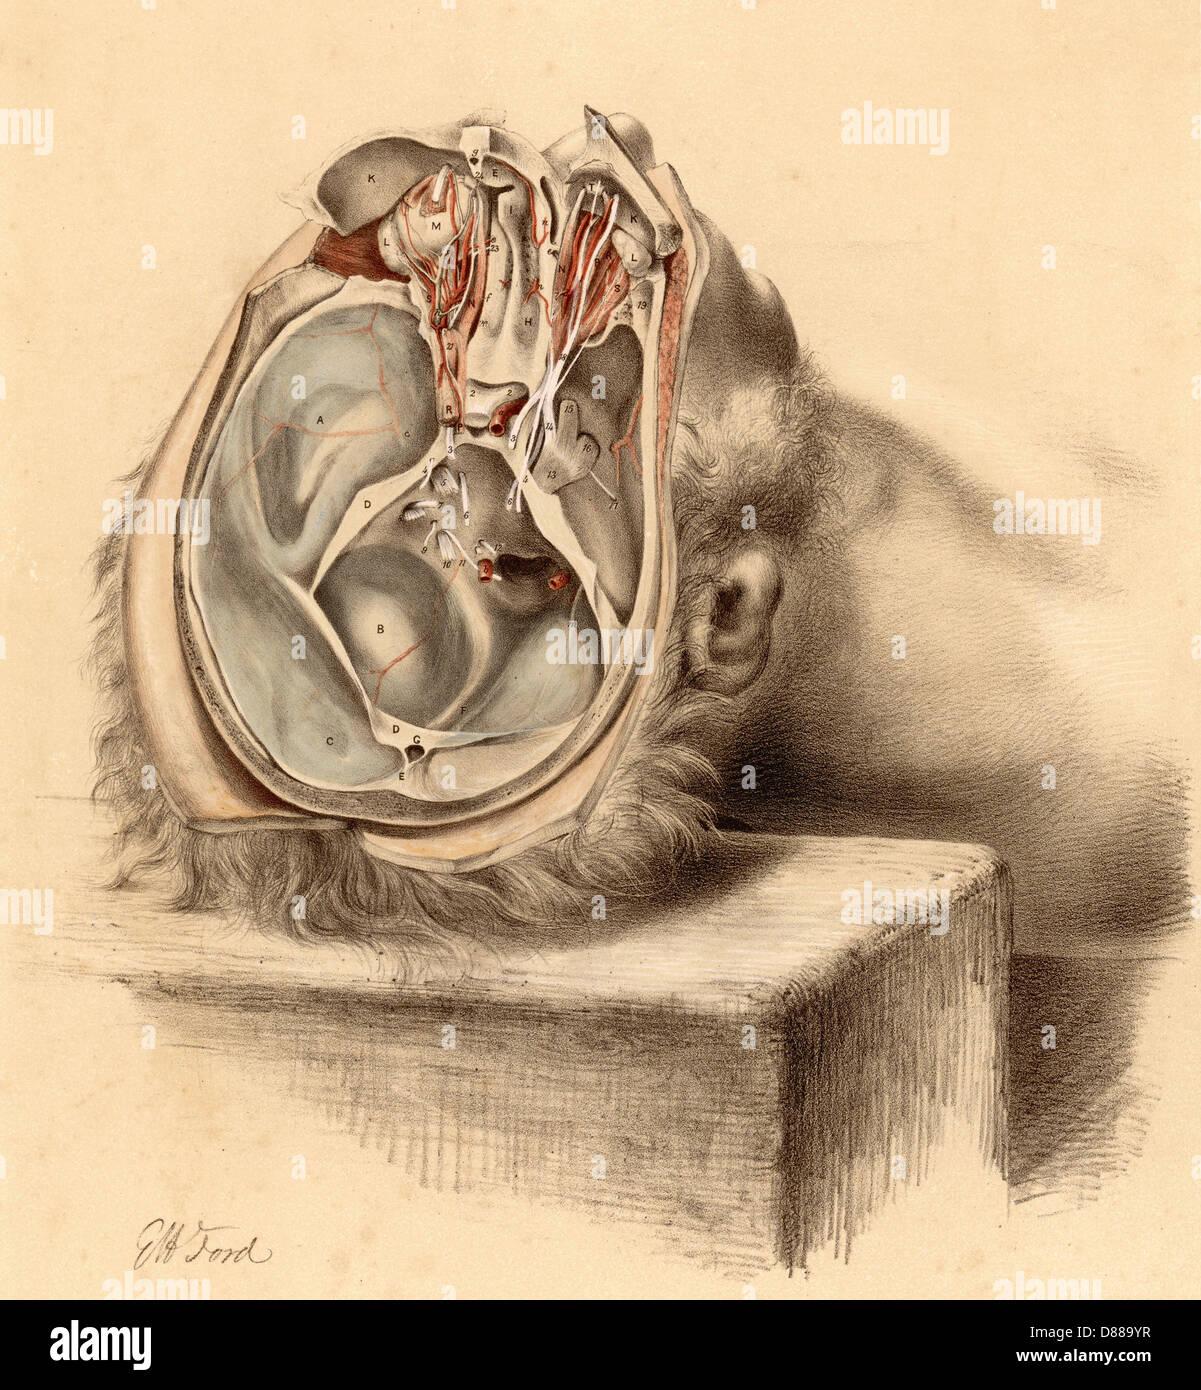 Anatomy Base Of Skull Stock Photo: 56731803 - Alamy